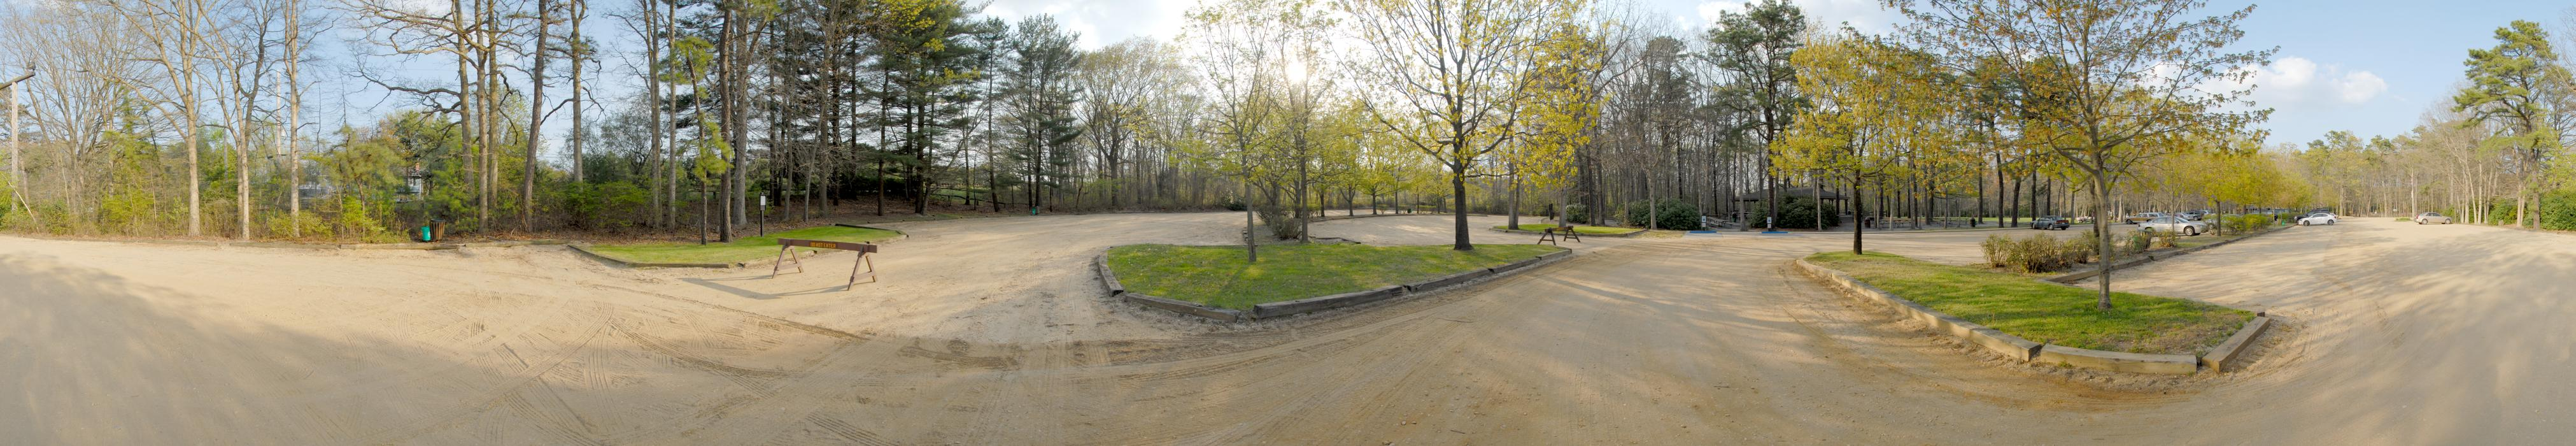 panoramic, parking, trees